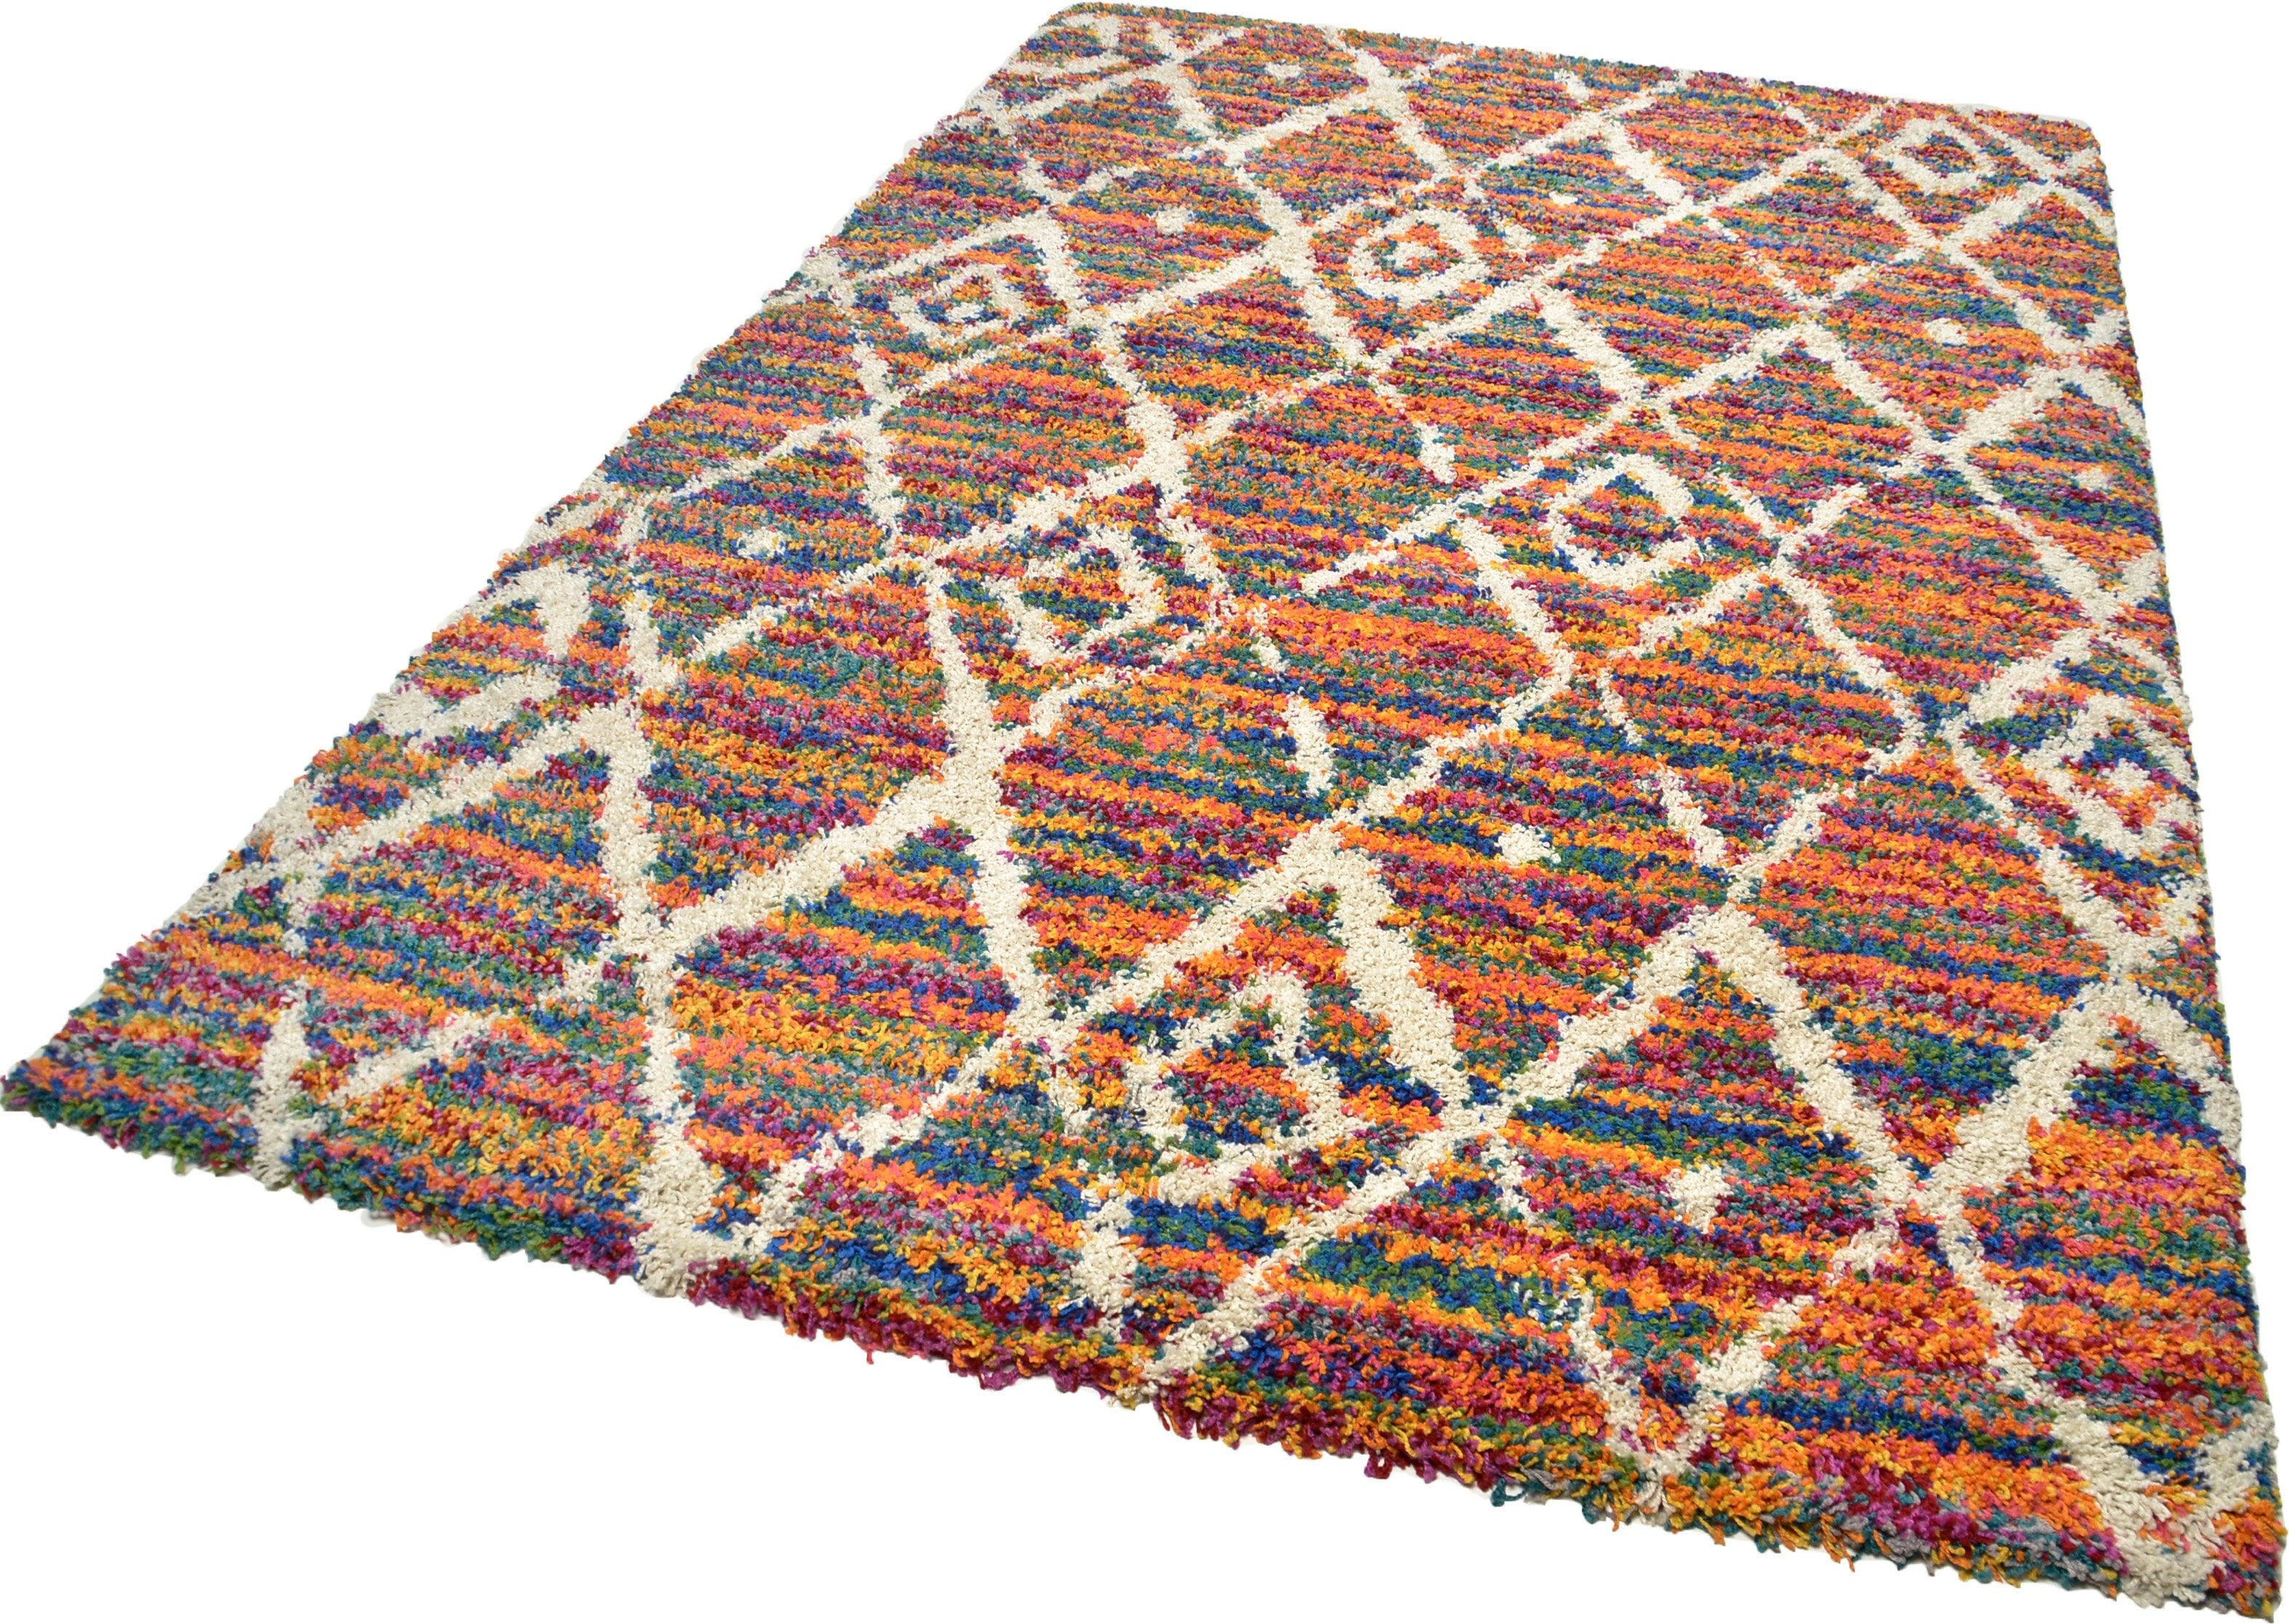 Hochflor-Teppich Color Shaggy 621 THEKO rechteckig Höhe 35 mm handgewebt